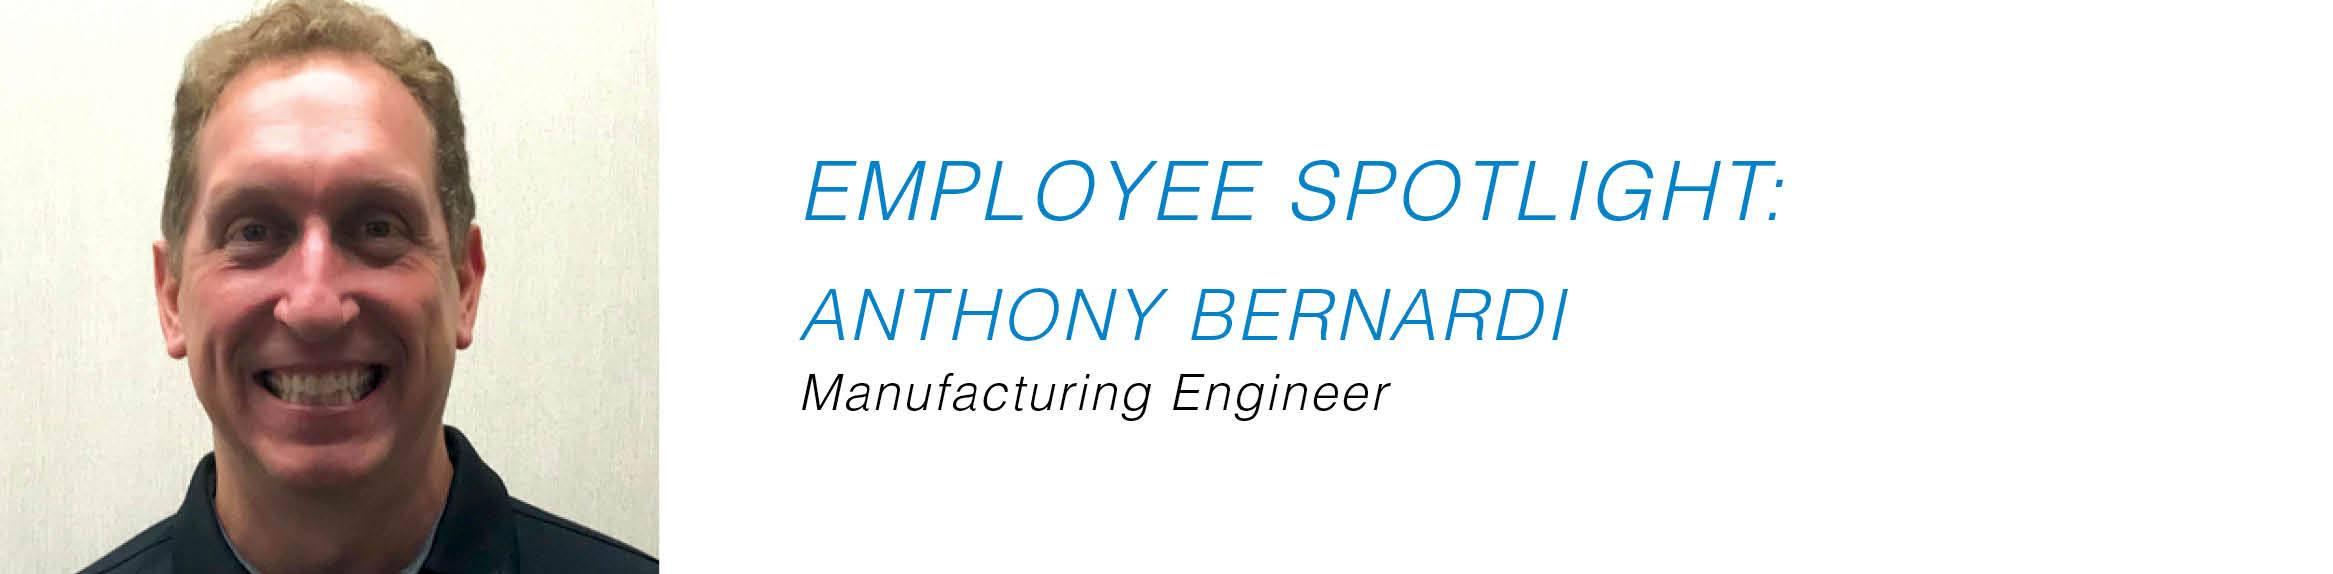 Employee Spotlight - Anthony Bernardi